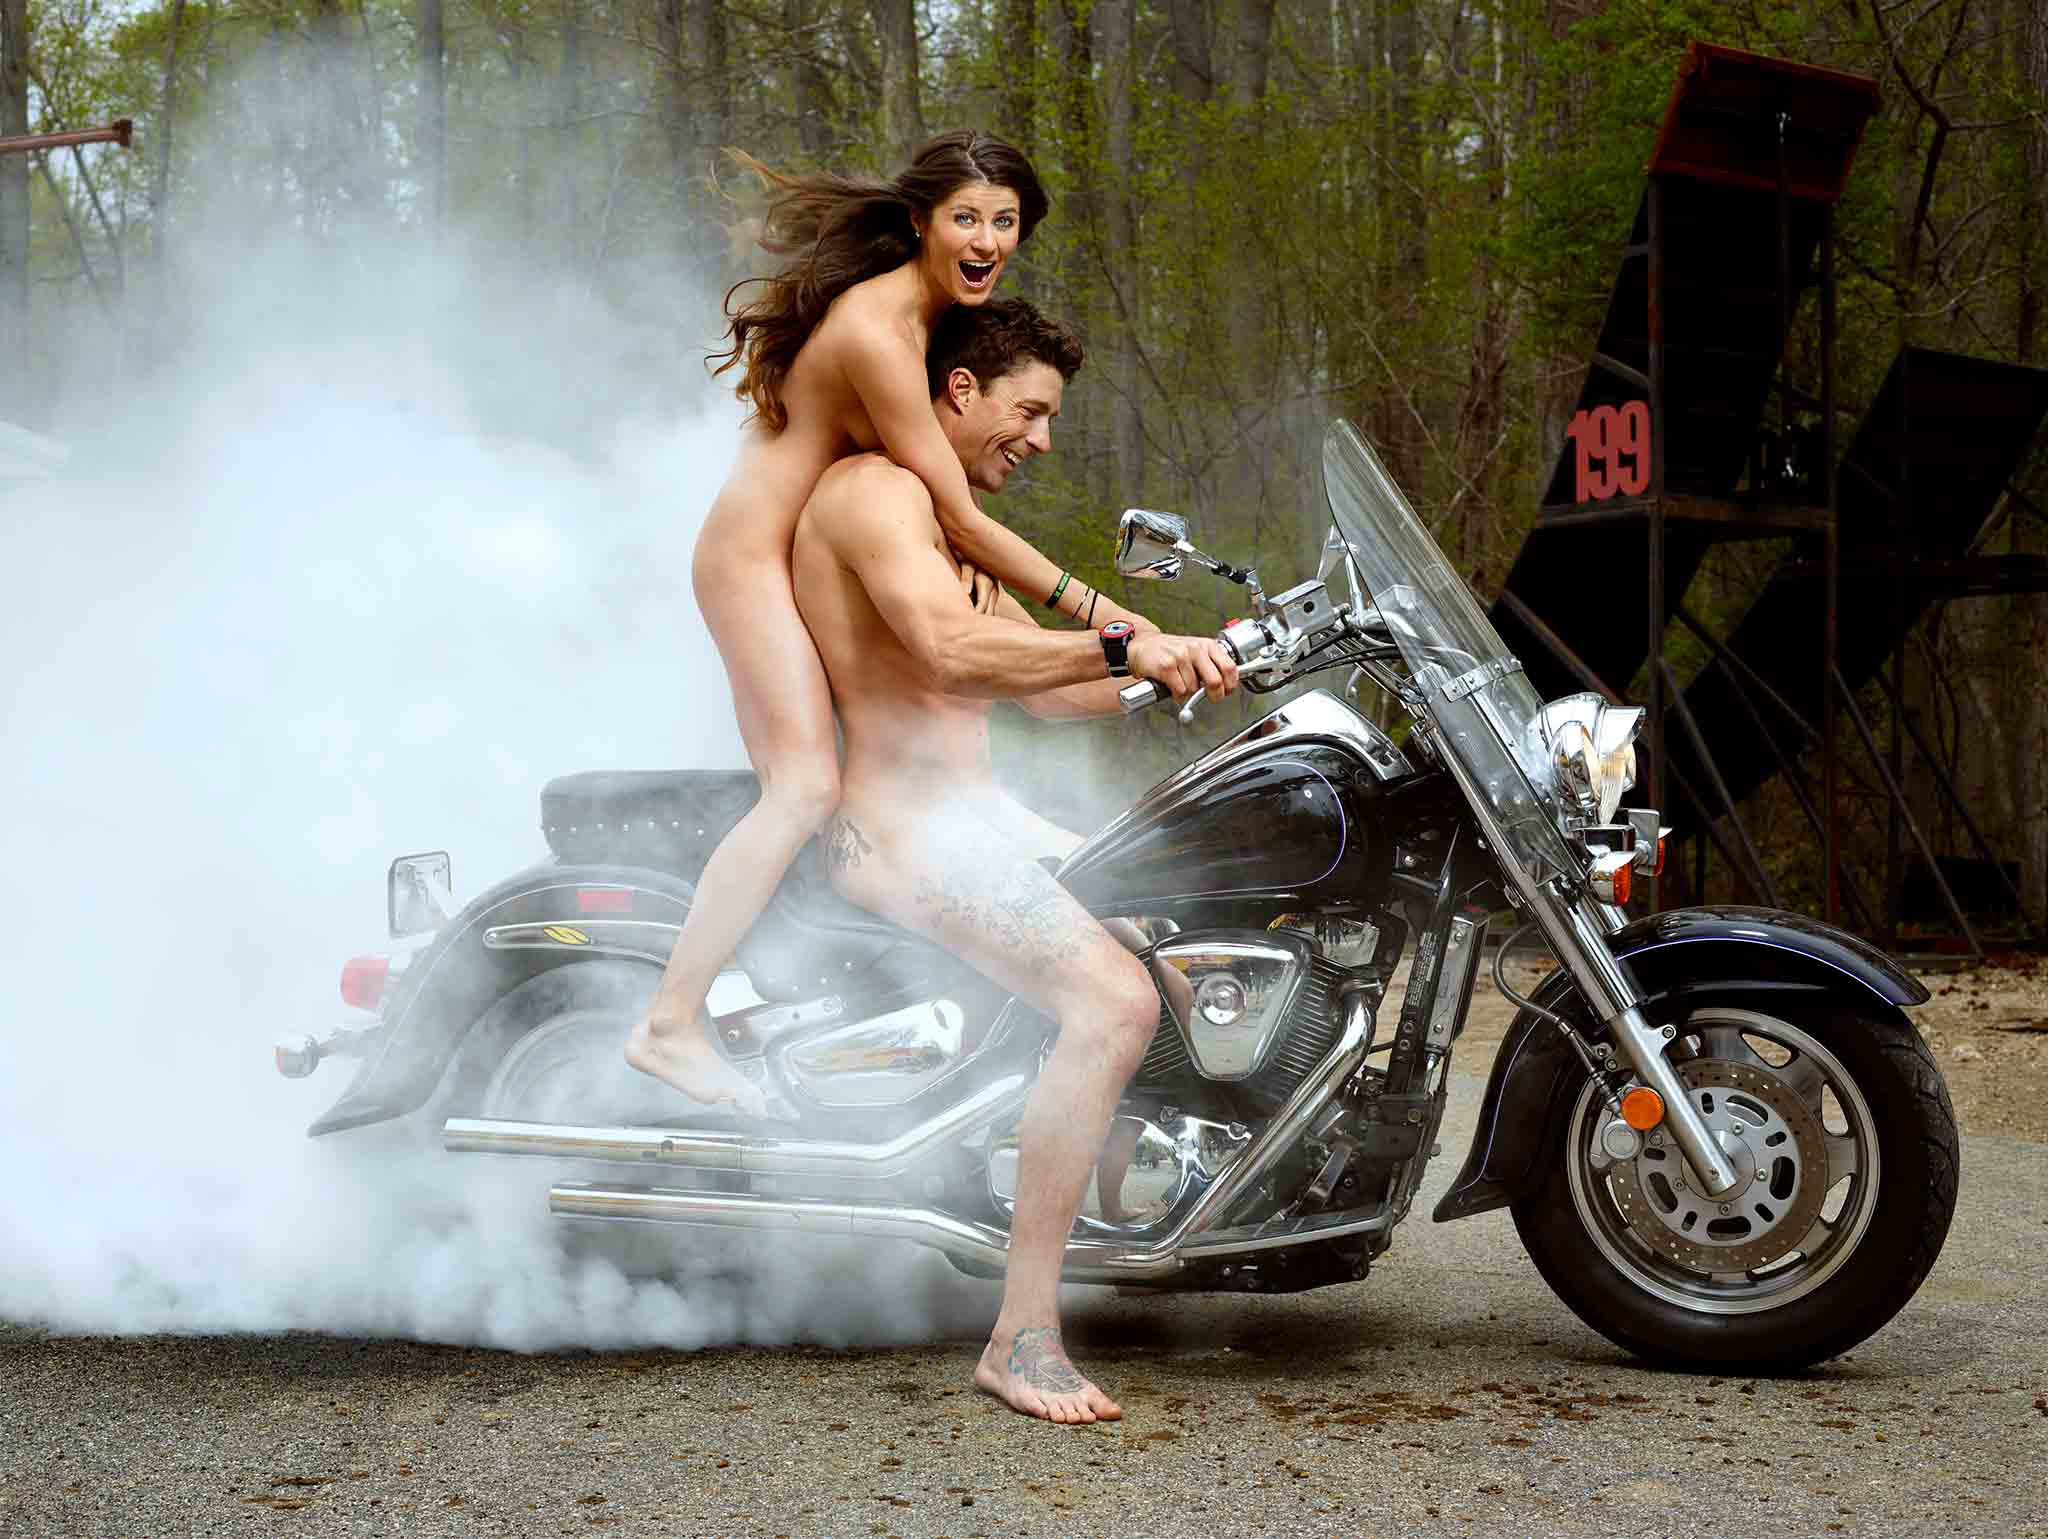 голый парень на мотоцикле